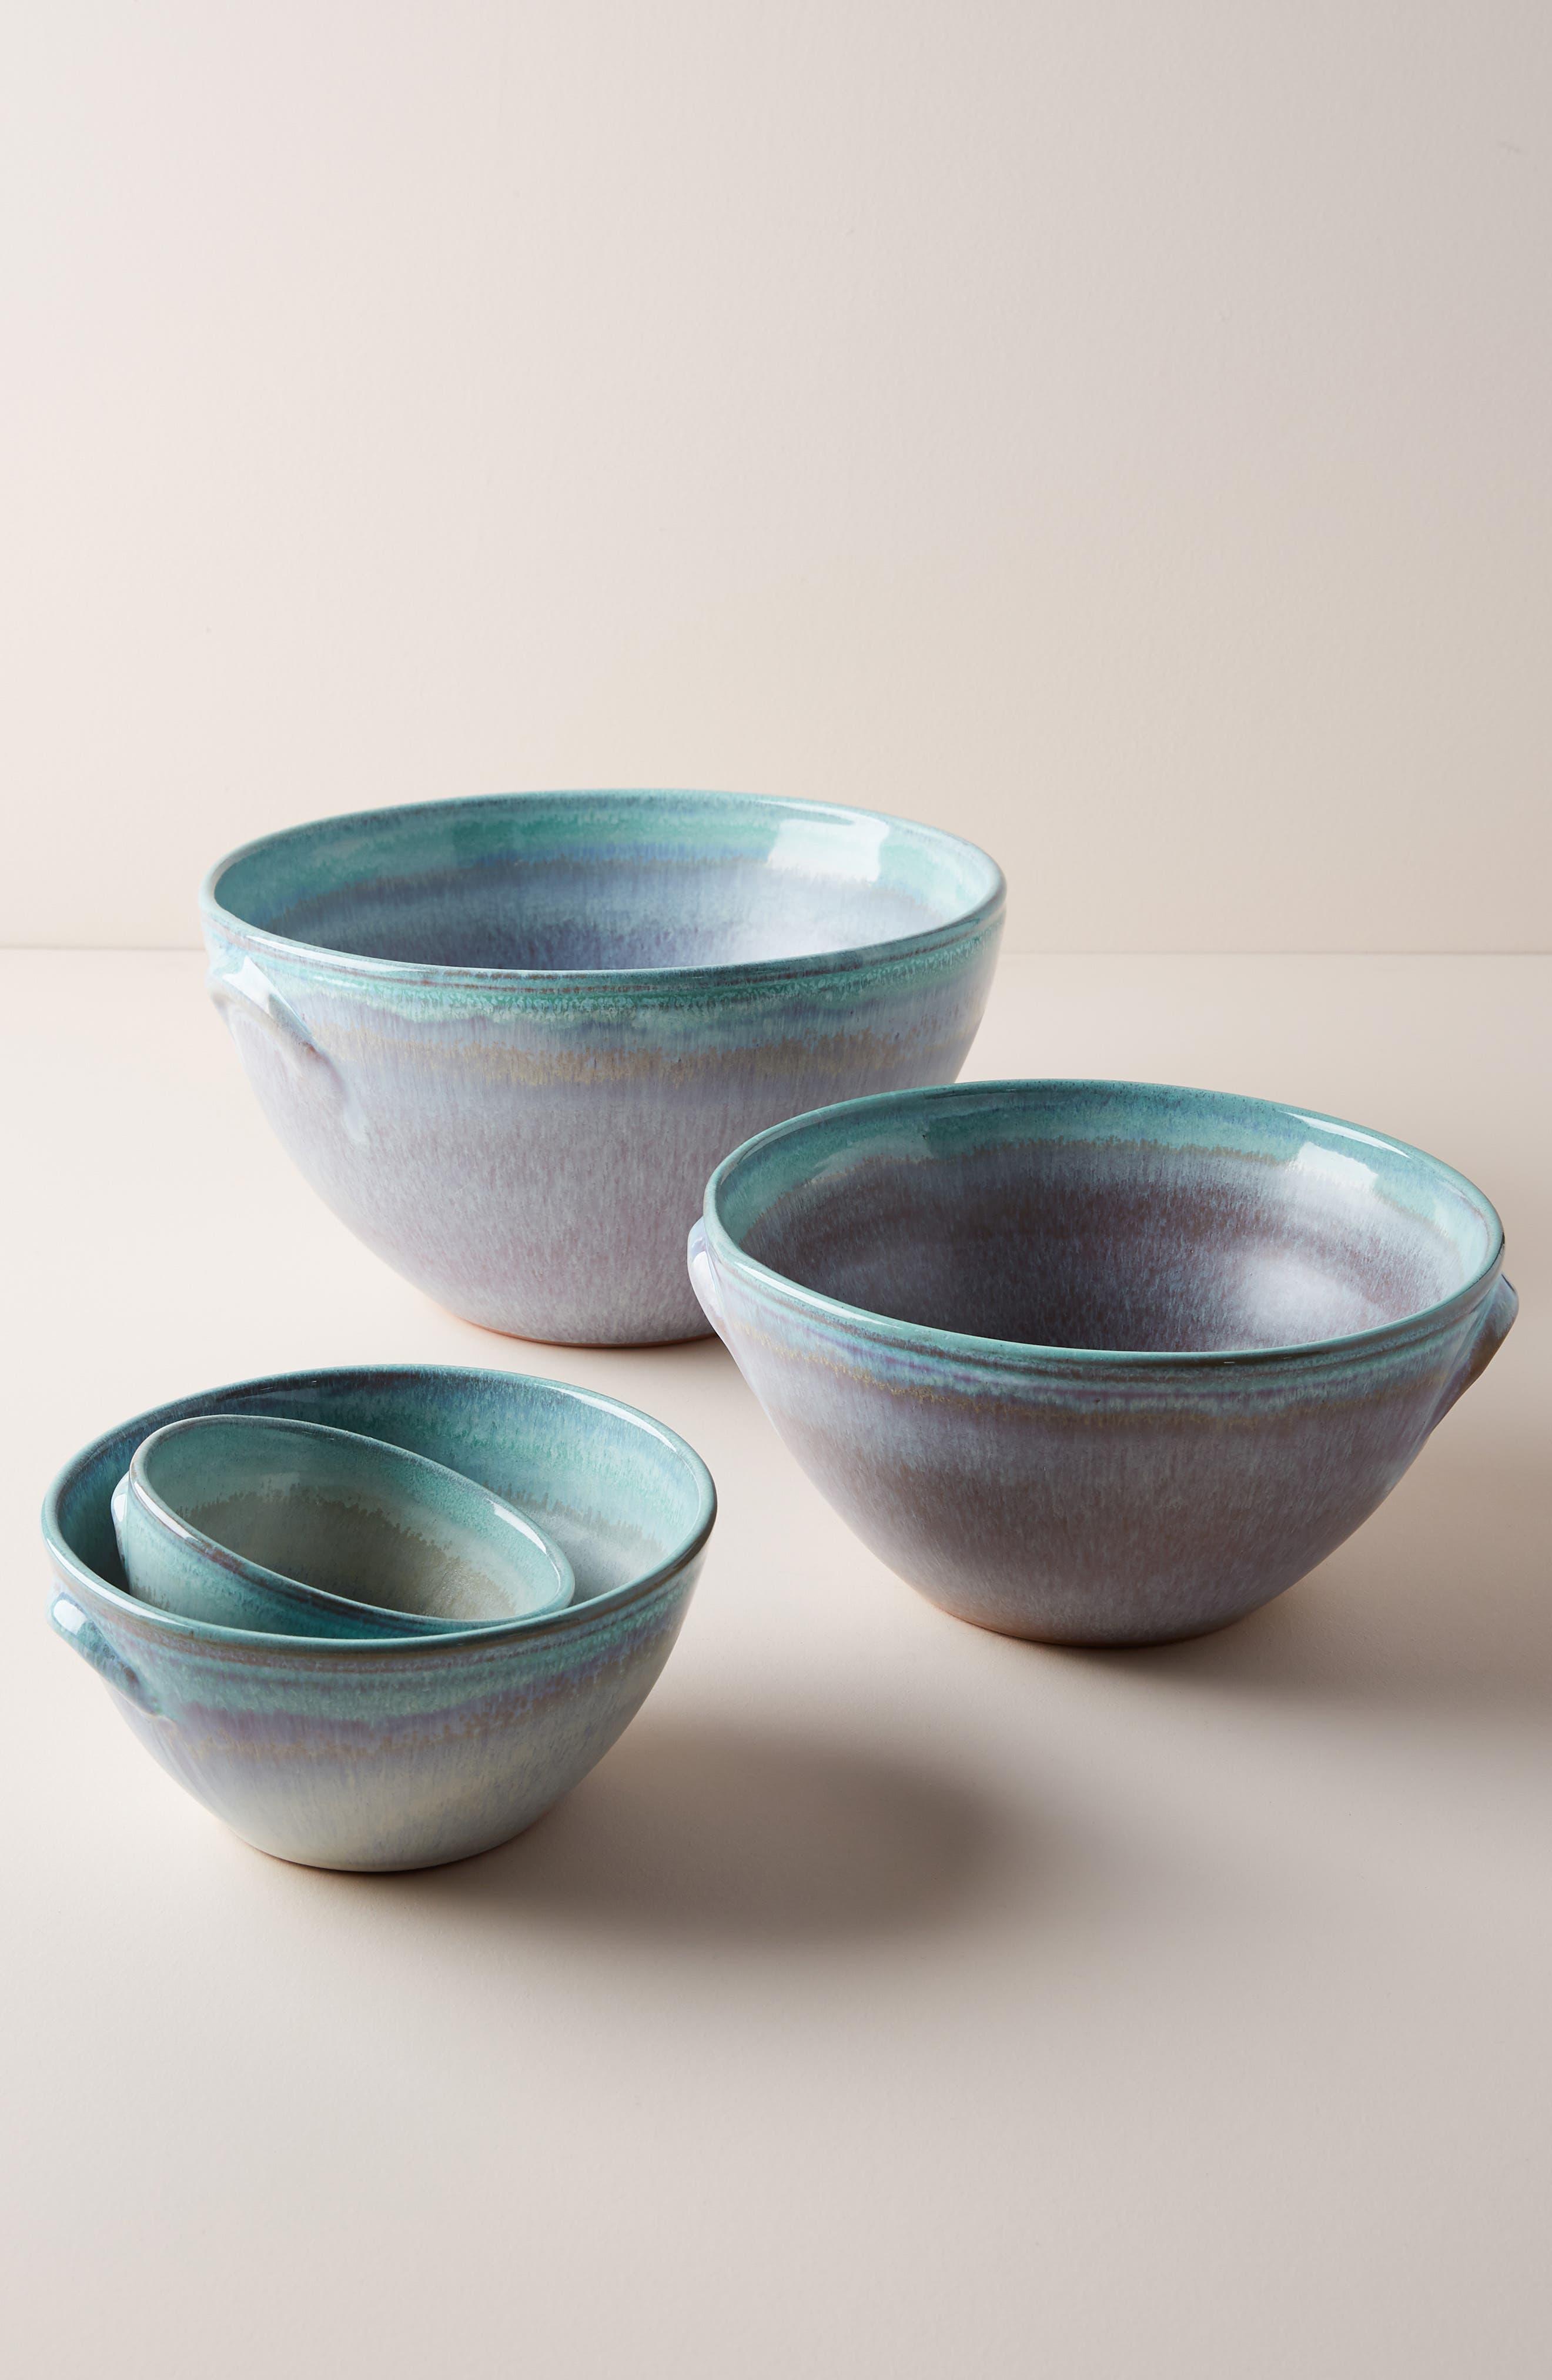 ANTHROPOLOGIE, Misty Set of 4 Bowls, Main thumbnail 1, color, WHITE/ MINT